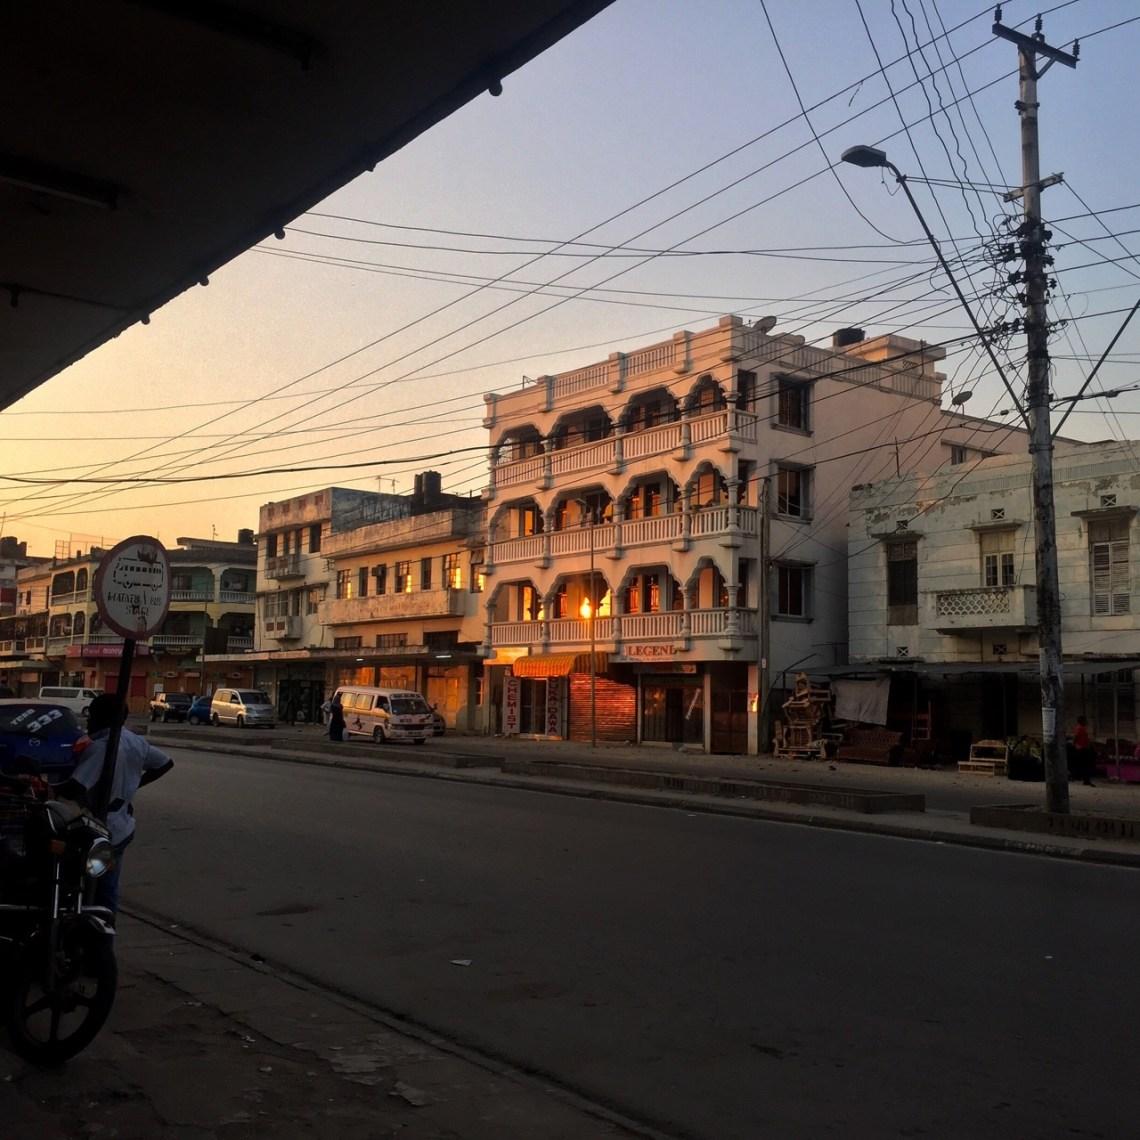 A view of Mombasa along Jomo Kenyatta Avenue at Sunset